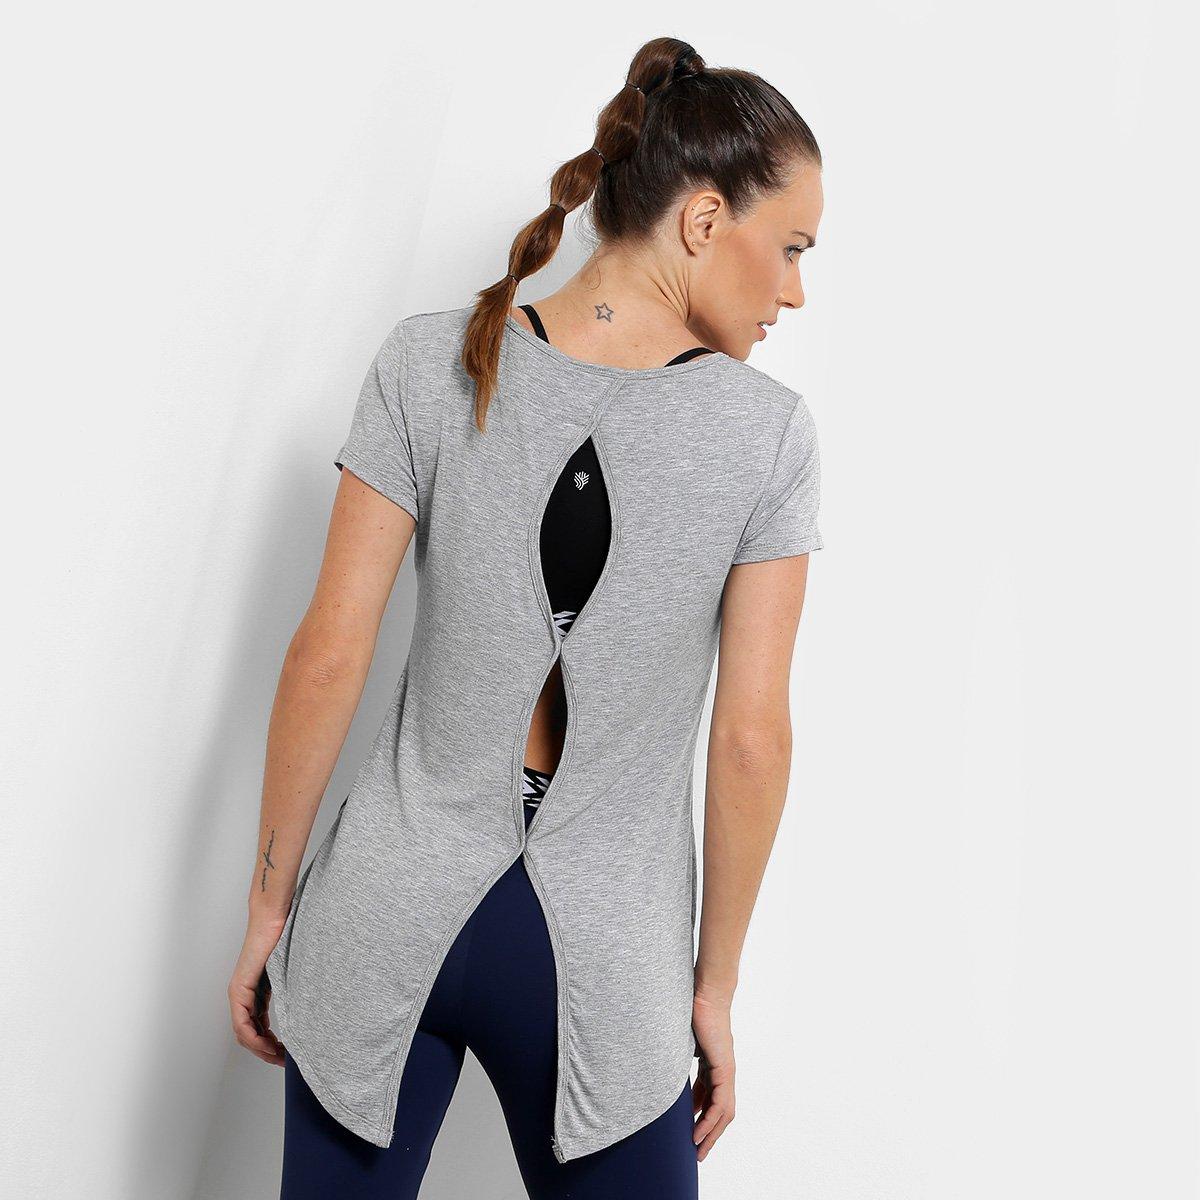 Camiseta Gonew Wrk Out Abertura Costas Feminina - 1